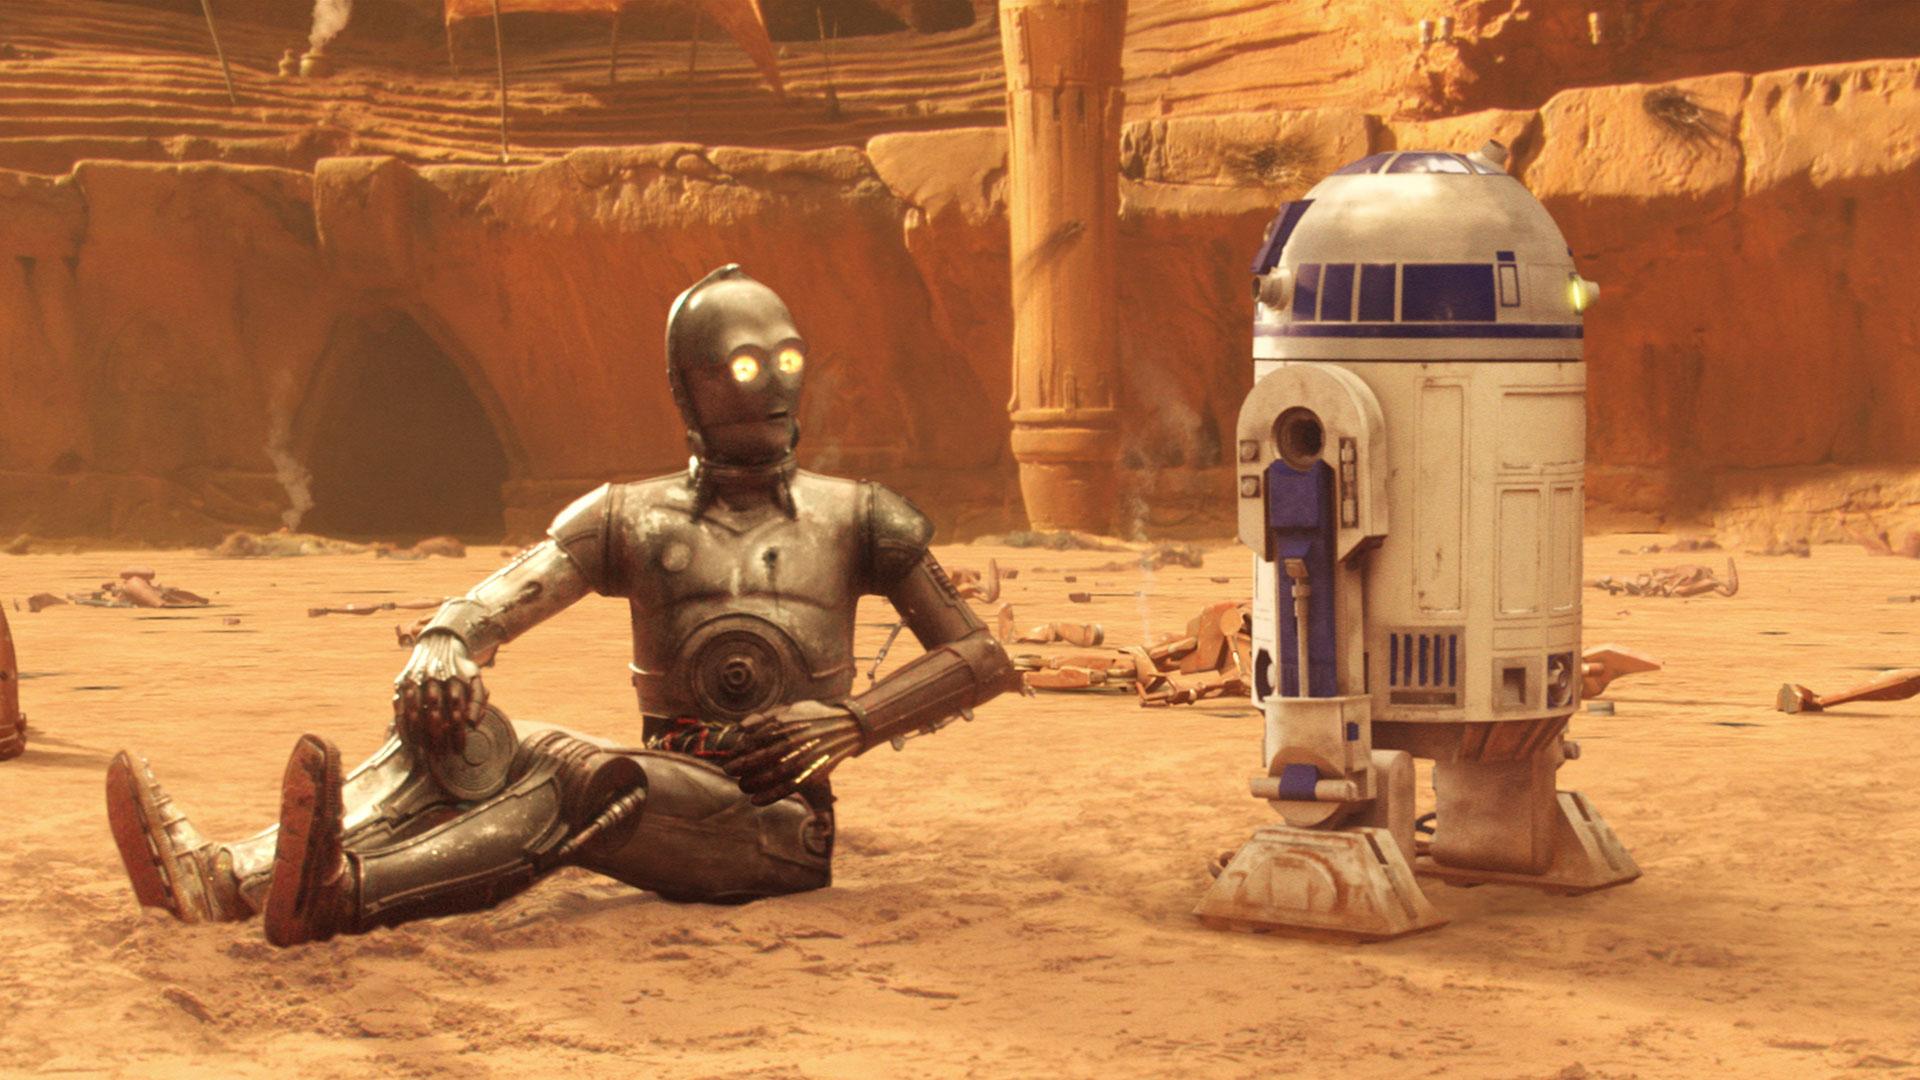 Maskotka Star Wars (C3-PO, R2-D2)